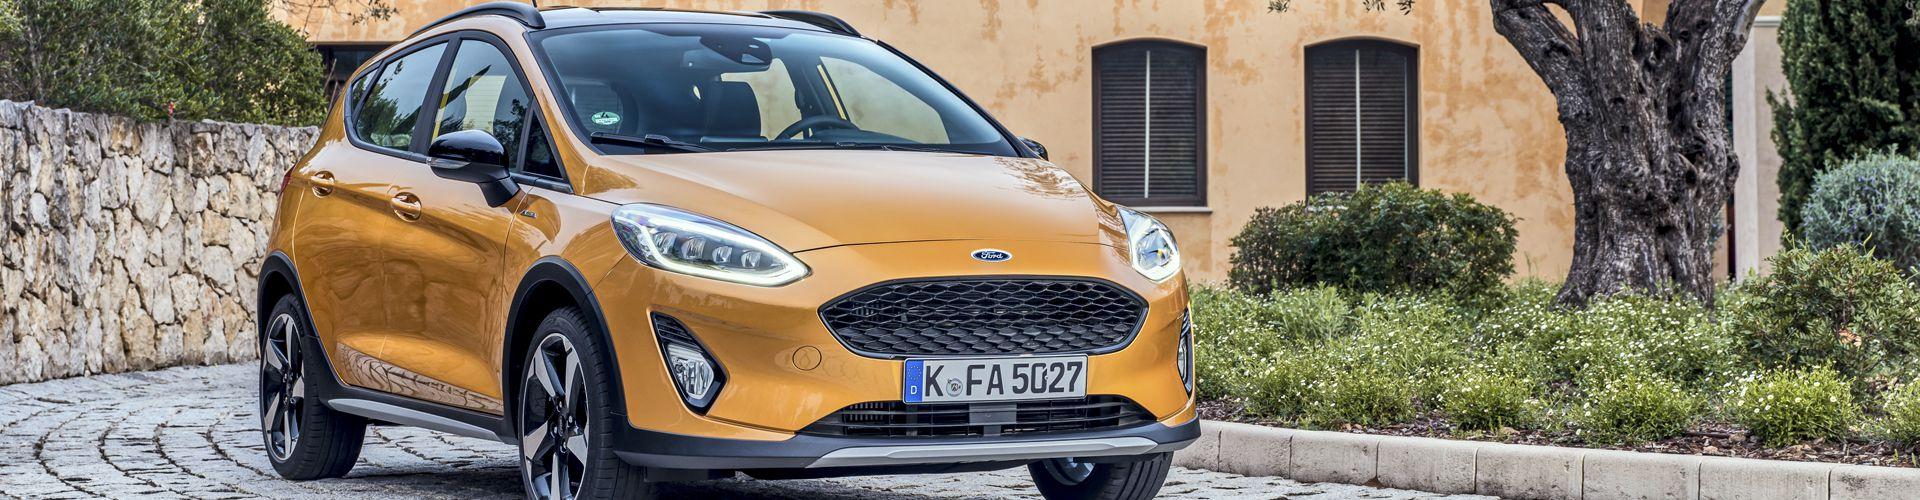 Ford Fiesta Active X - Liapis Bros